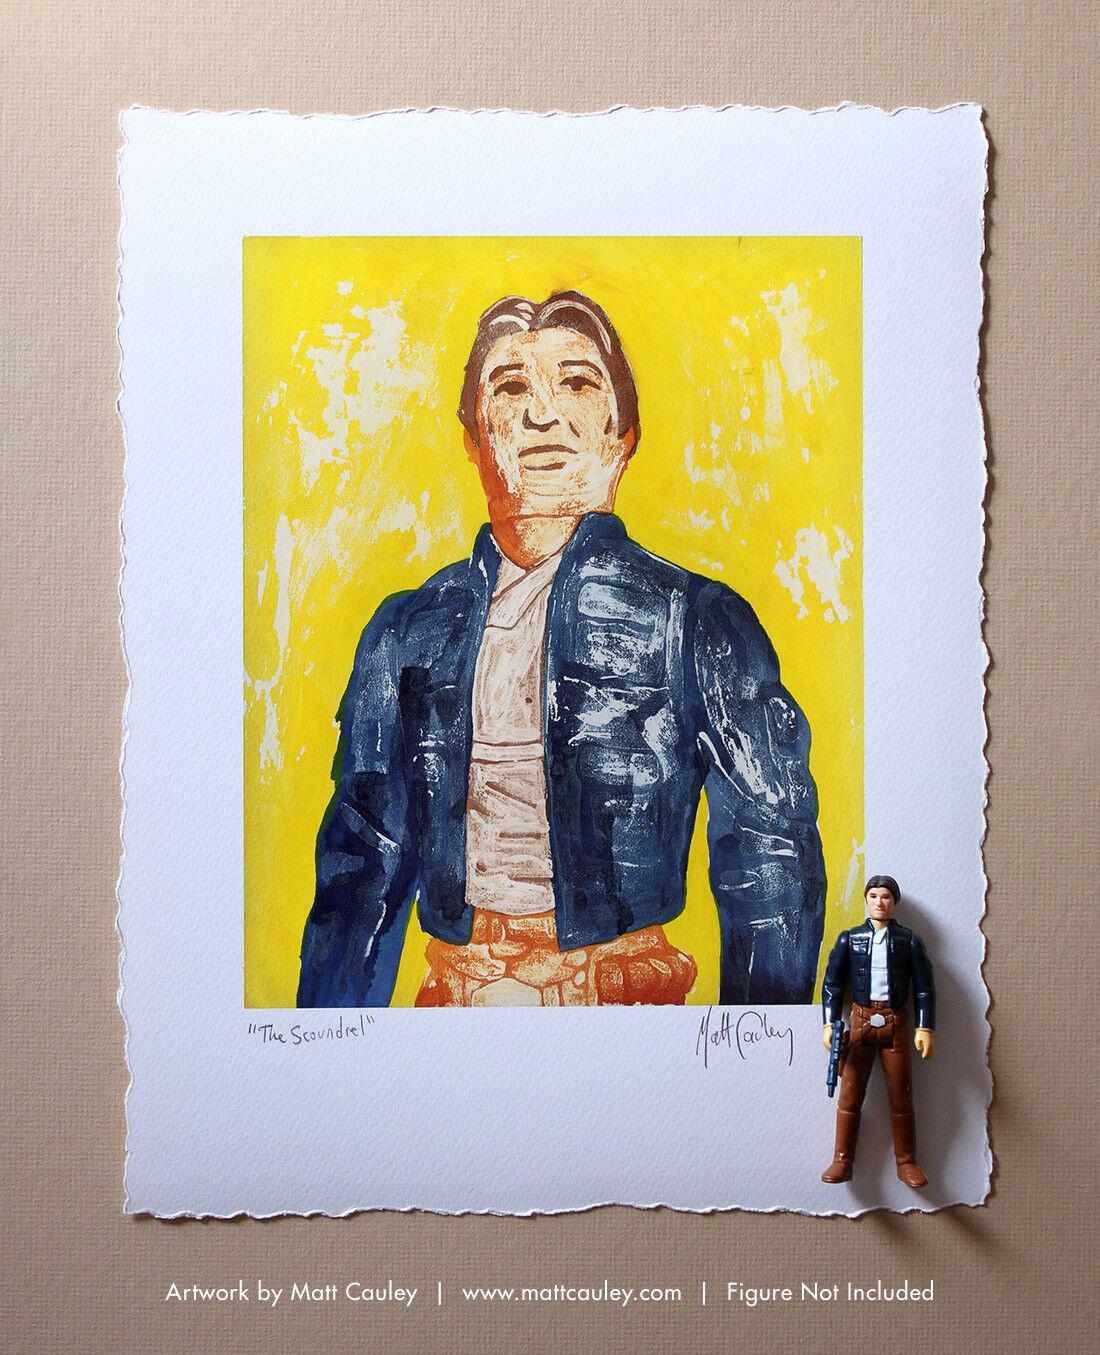 BESPIN HAN SOLO Vintage Kenner Star Wars Action Figure ORIGINAL ART PRINT 3.75